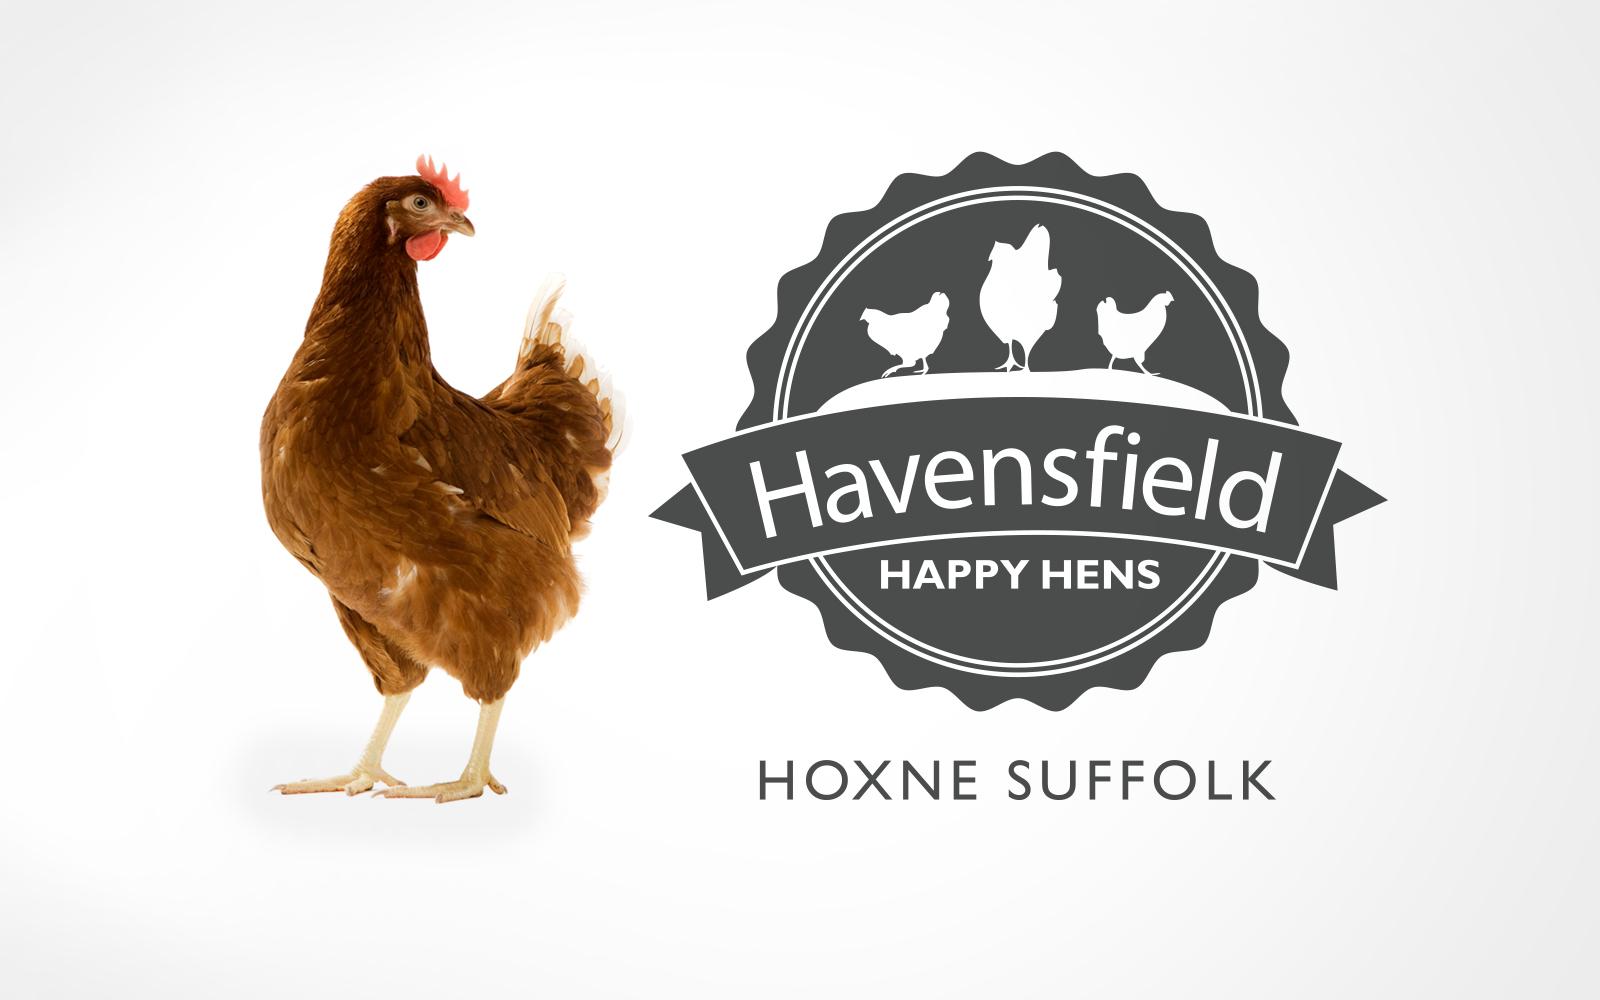 Havensfield Happy Hens logo